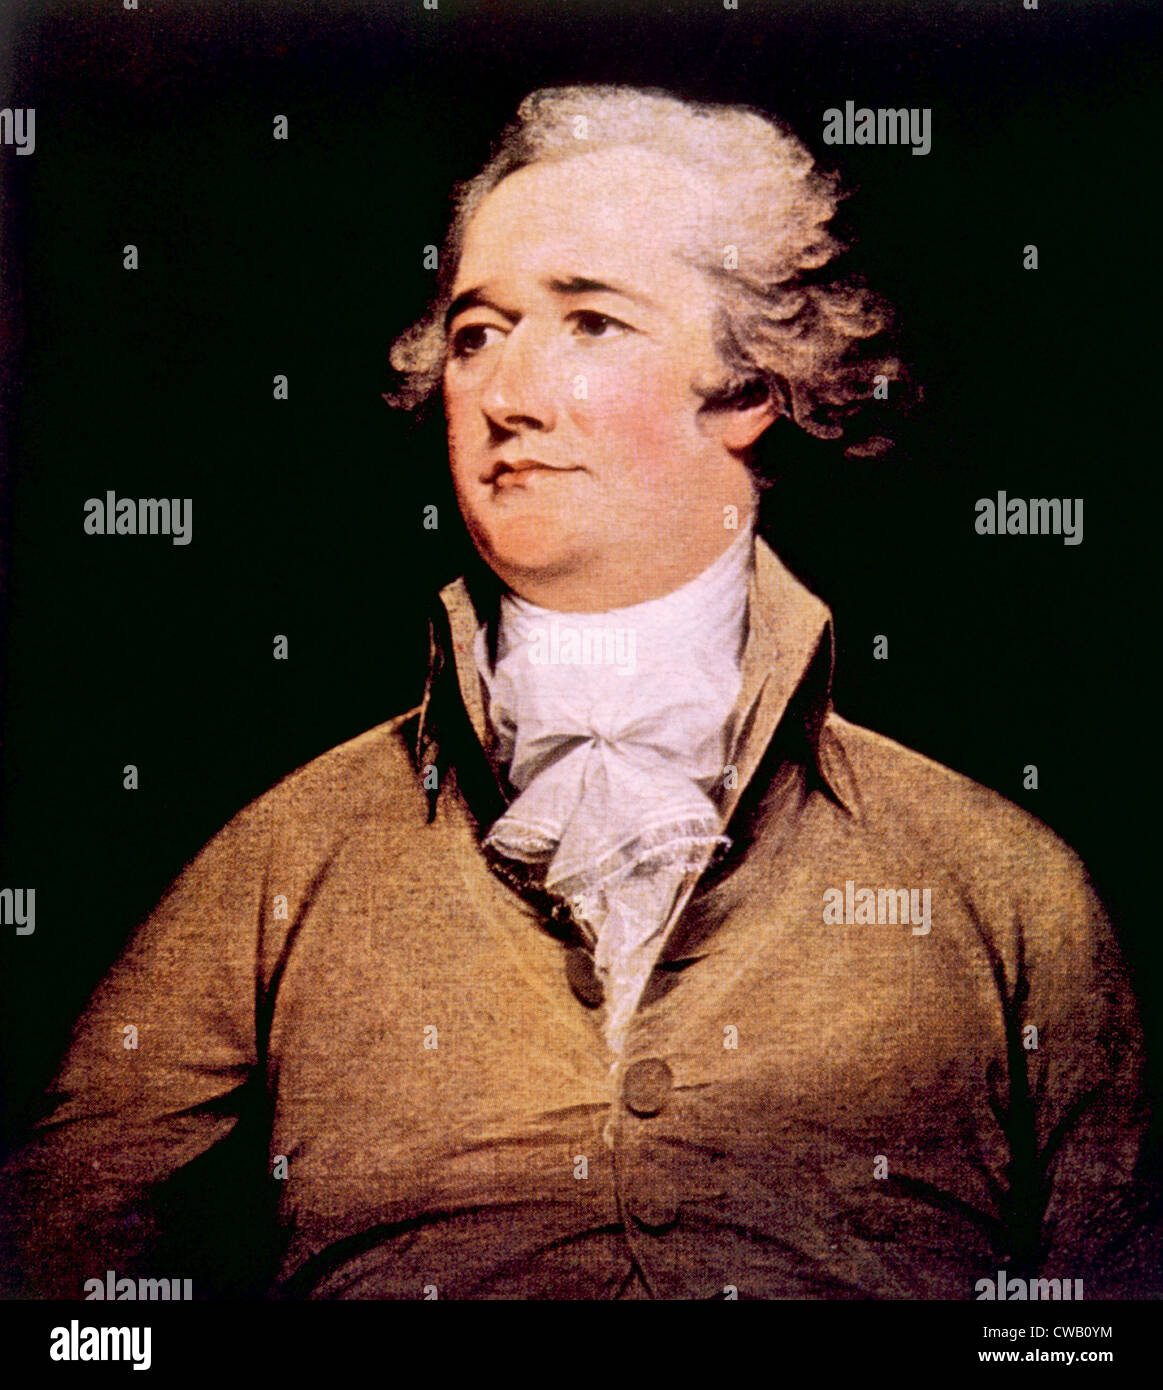 Alexander Hamilton (1755-1804) Photo Stock